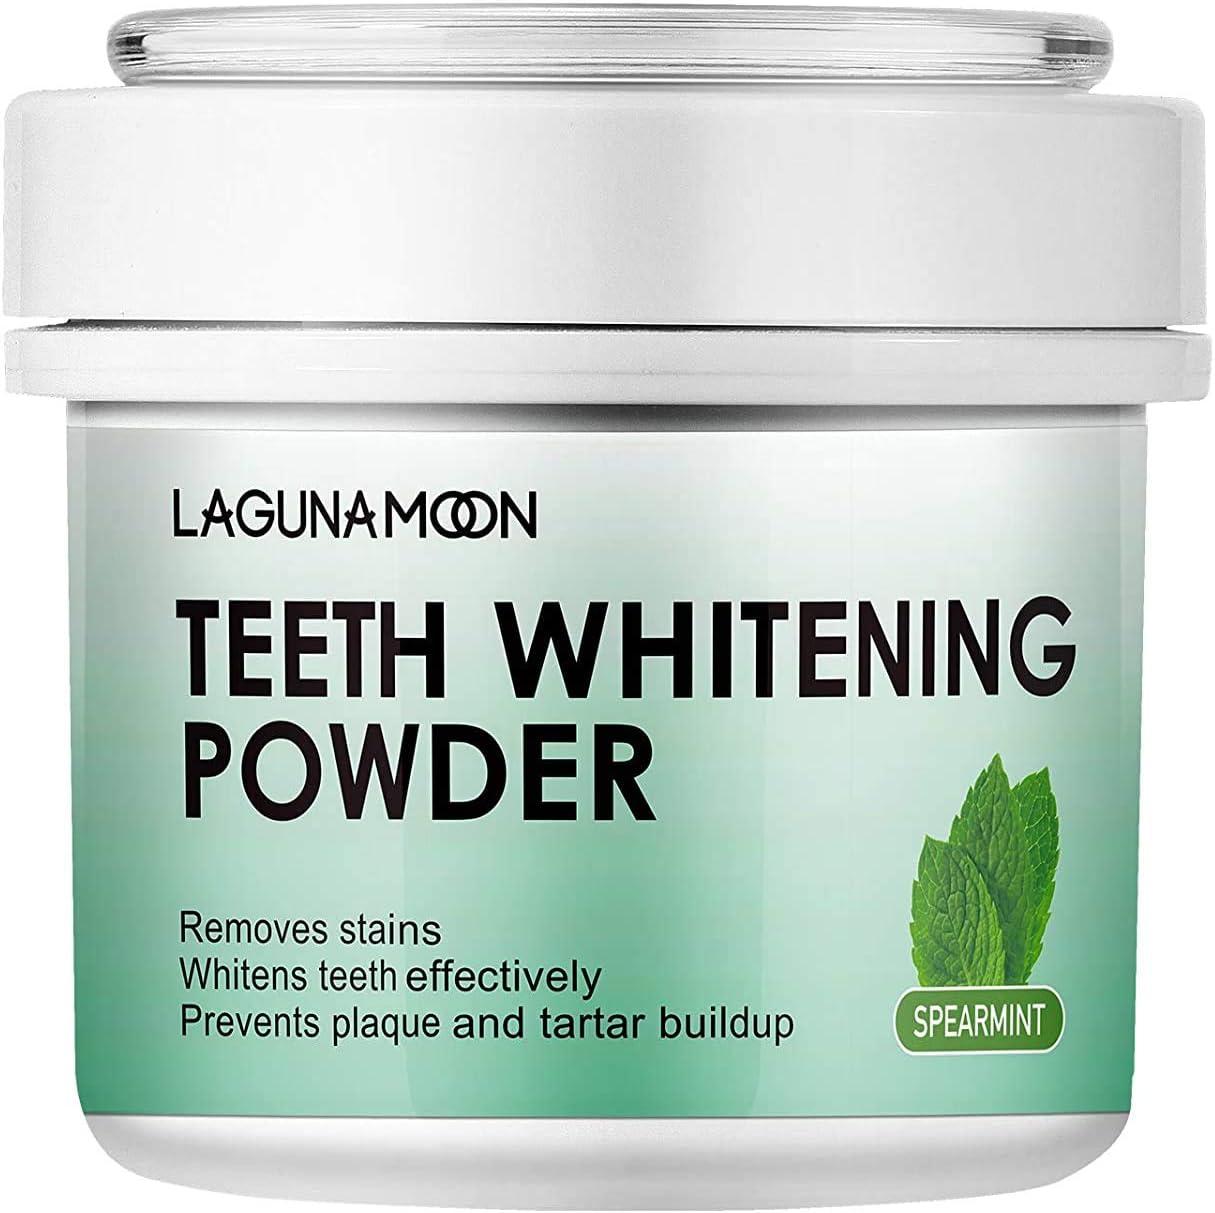 Lagunamoon Blanqueamiento Dental de Polvo de Perla, Polvo para Dientes Natural, Teeth Whitening 50g